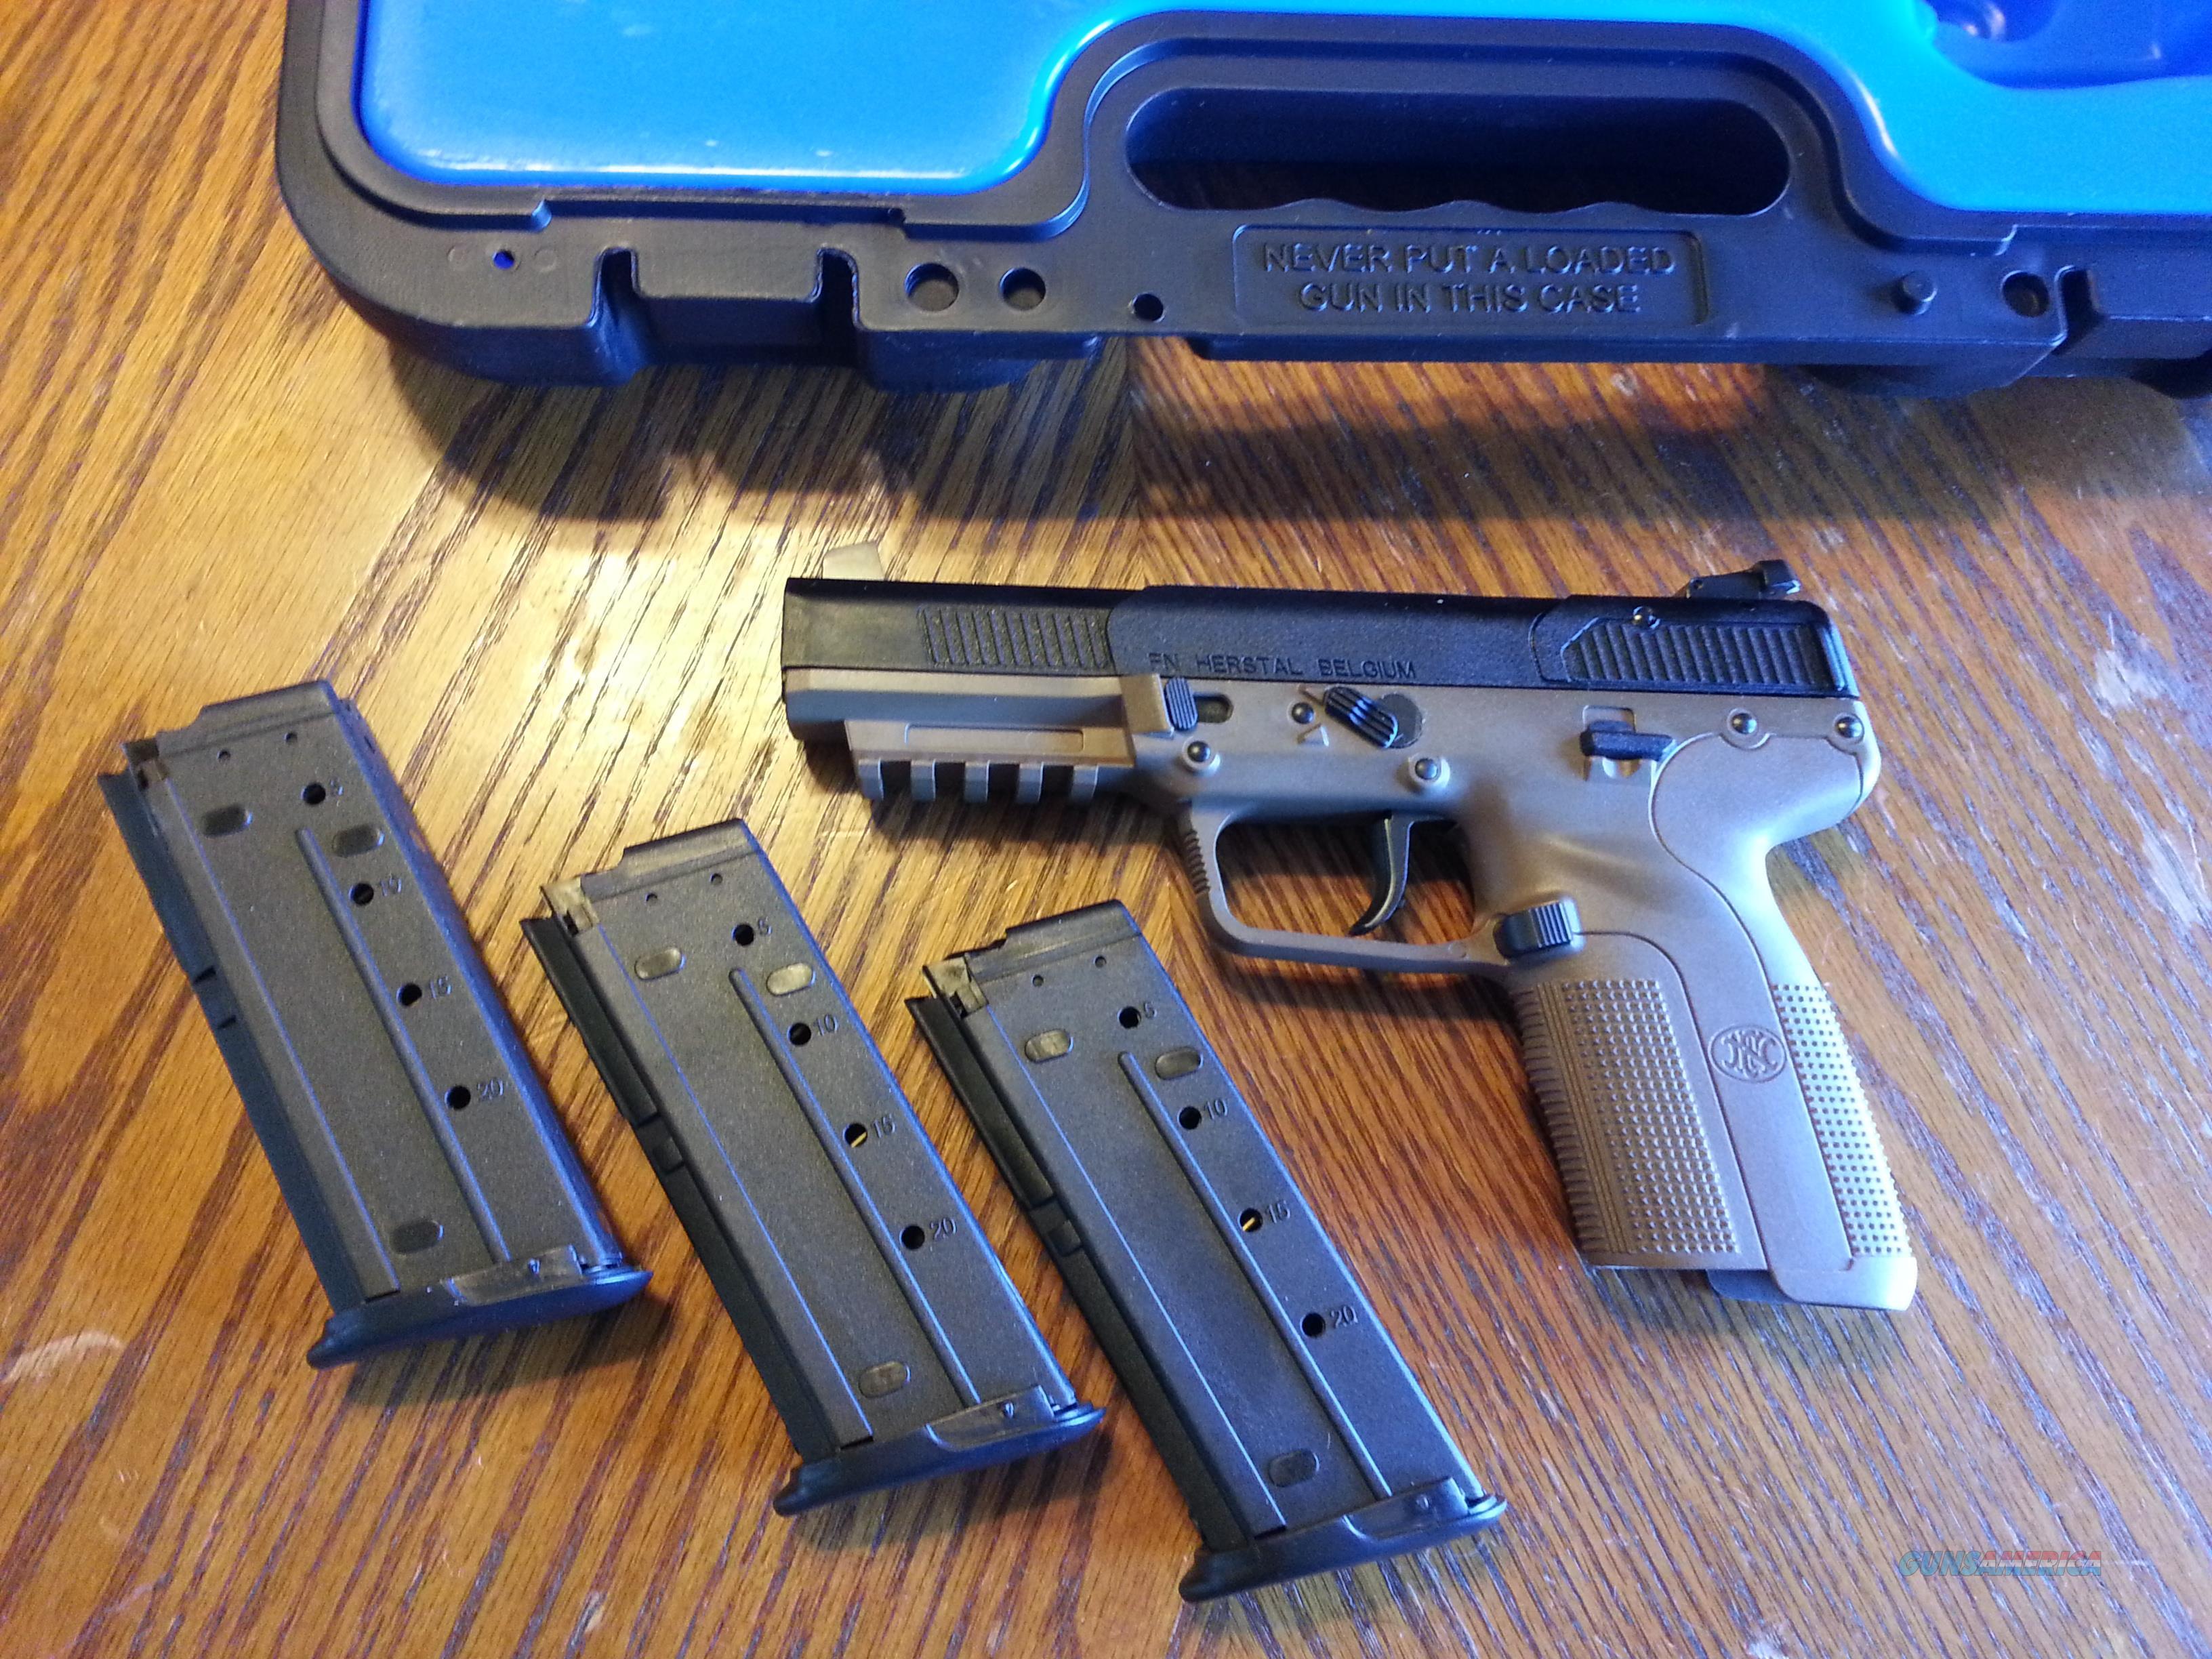 FN Five-Seven 5.7 Pistol, MK II, 5.7 x 28mm, NIB, (3) 20 Round Mags FDE FREE LAYAWAY  Guns > Pistols > FNH - Fabrique Nationale (FN) Pistols > FiveSeven